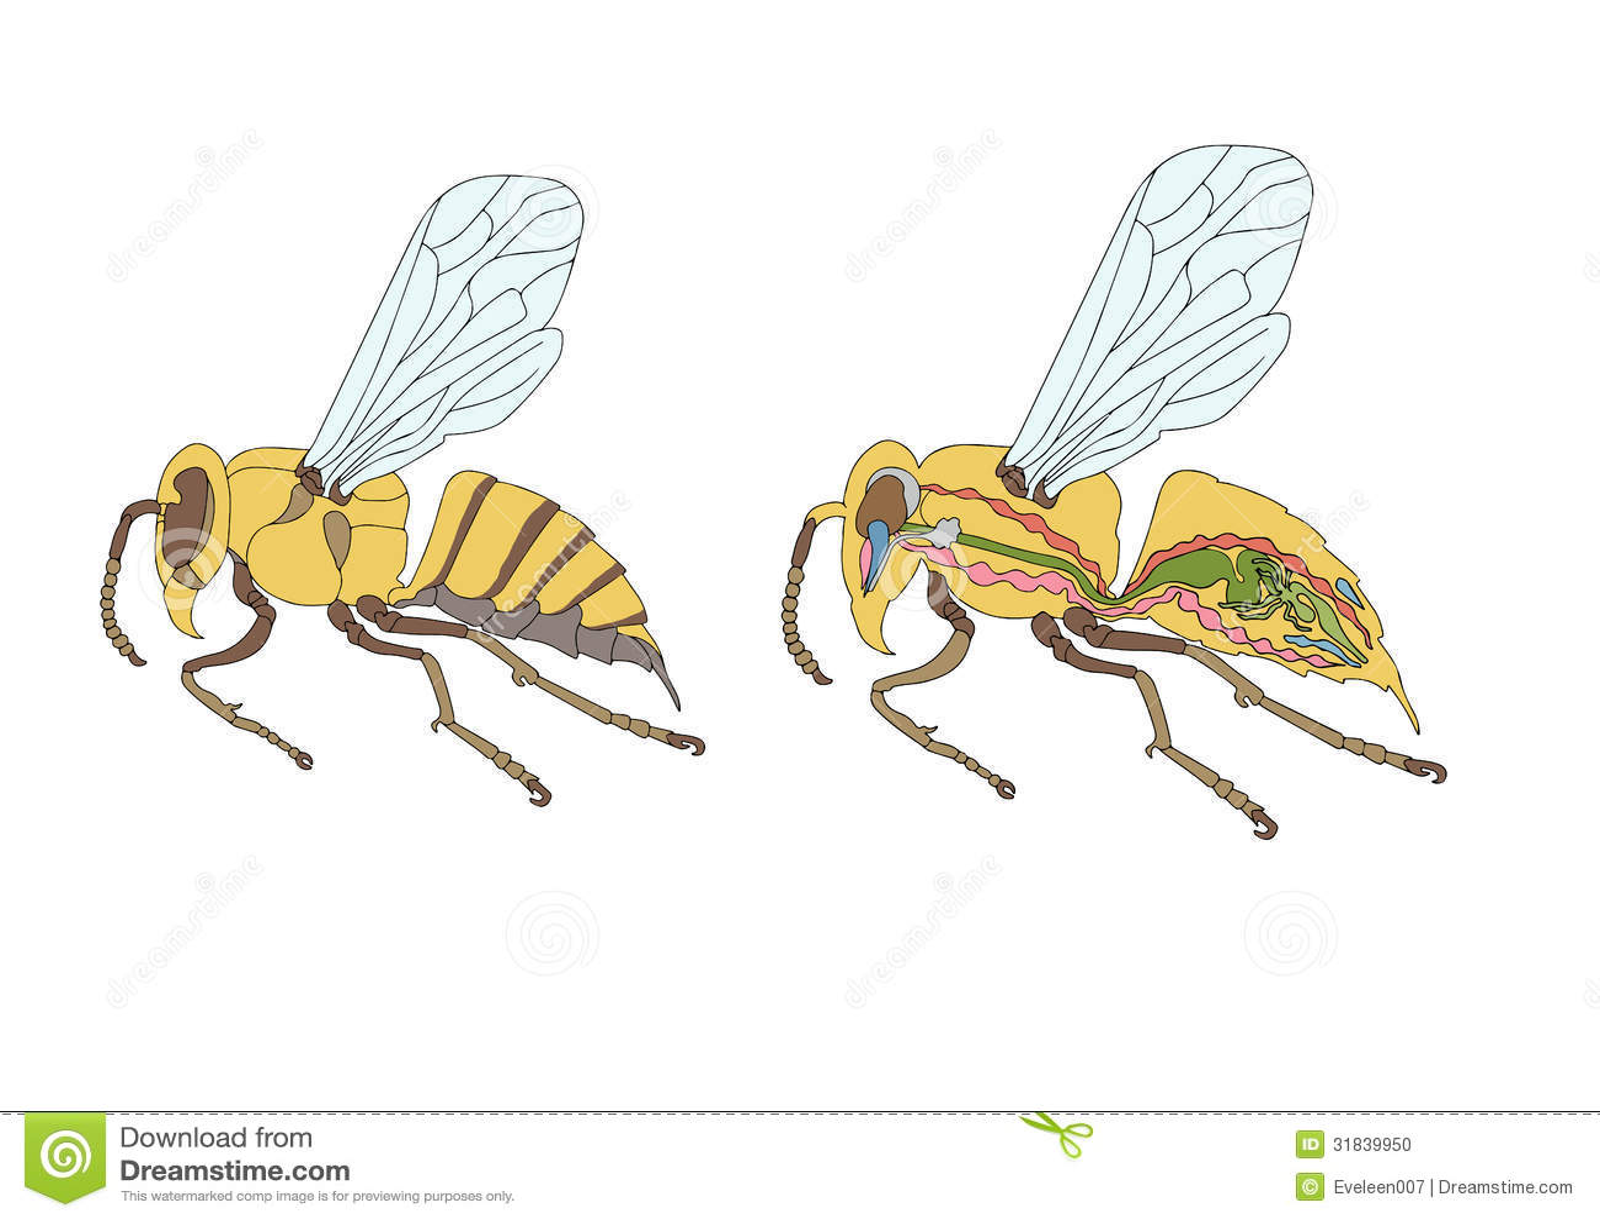 Morphologie, Querschnitt Der Biene Vektor Abbildung - Illustration ...